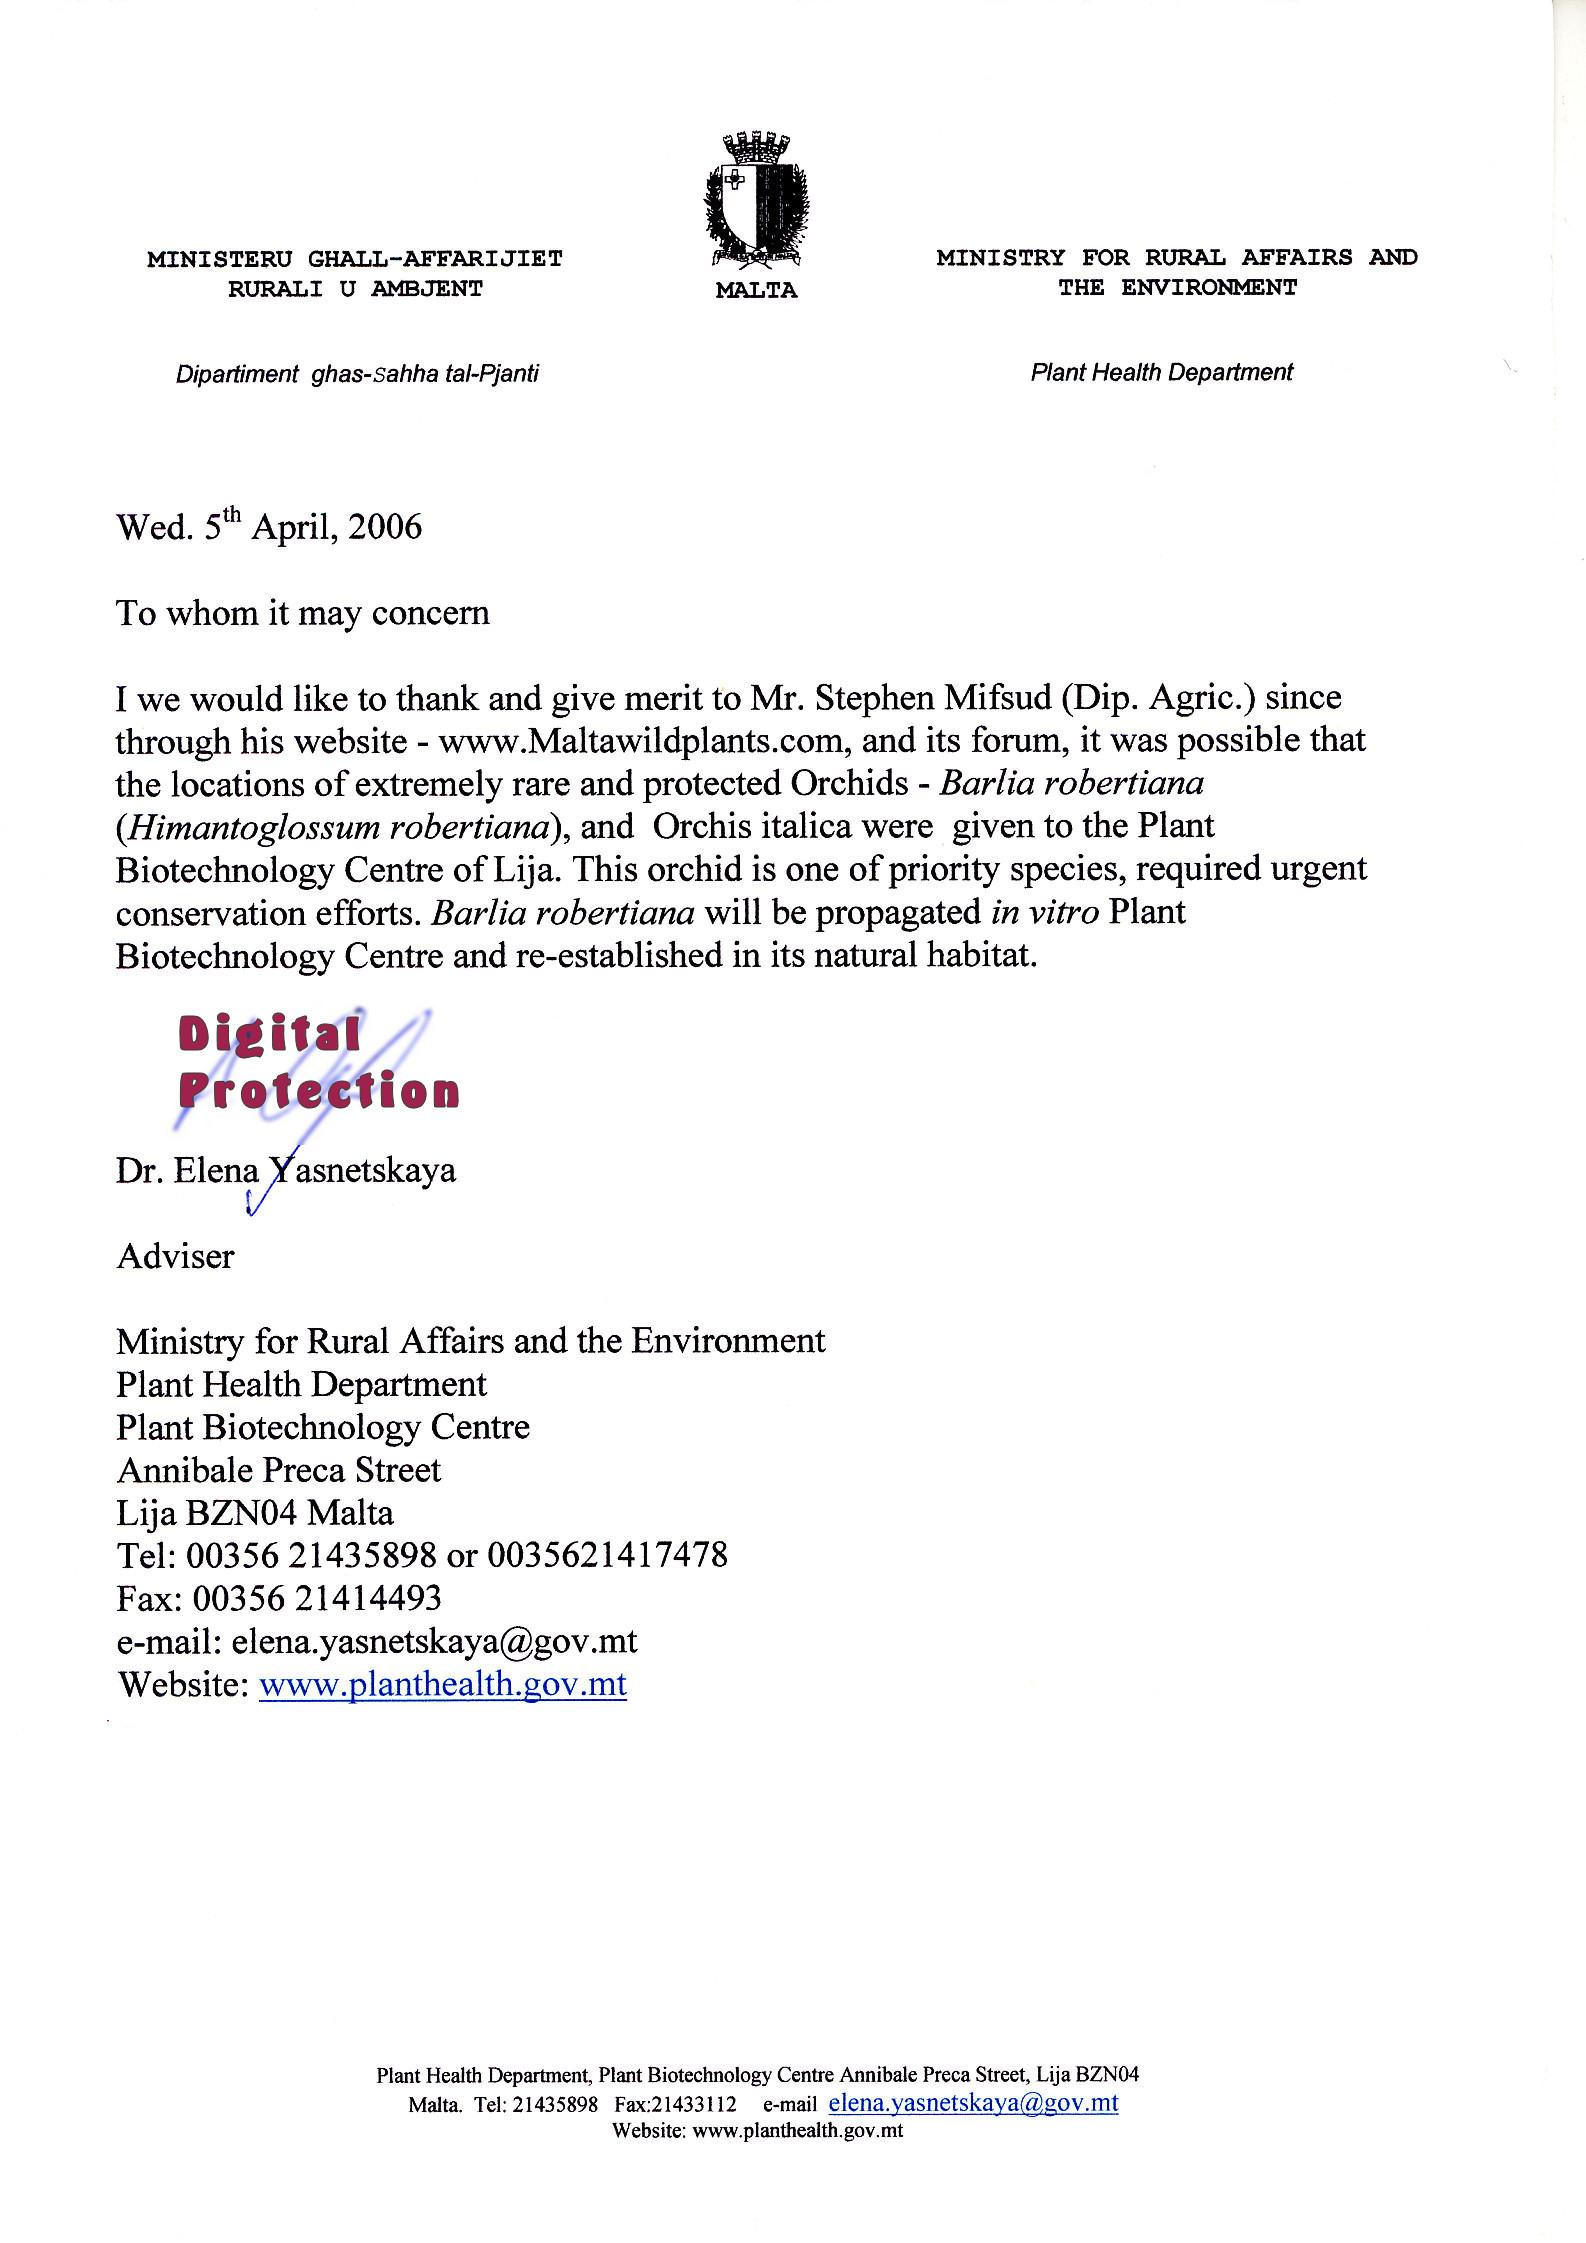 Sample Letter Of Recommendation For Teacher Eduers Sample Letter Of Recommendation For Medical School From Doctor